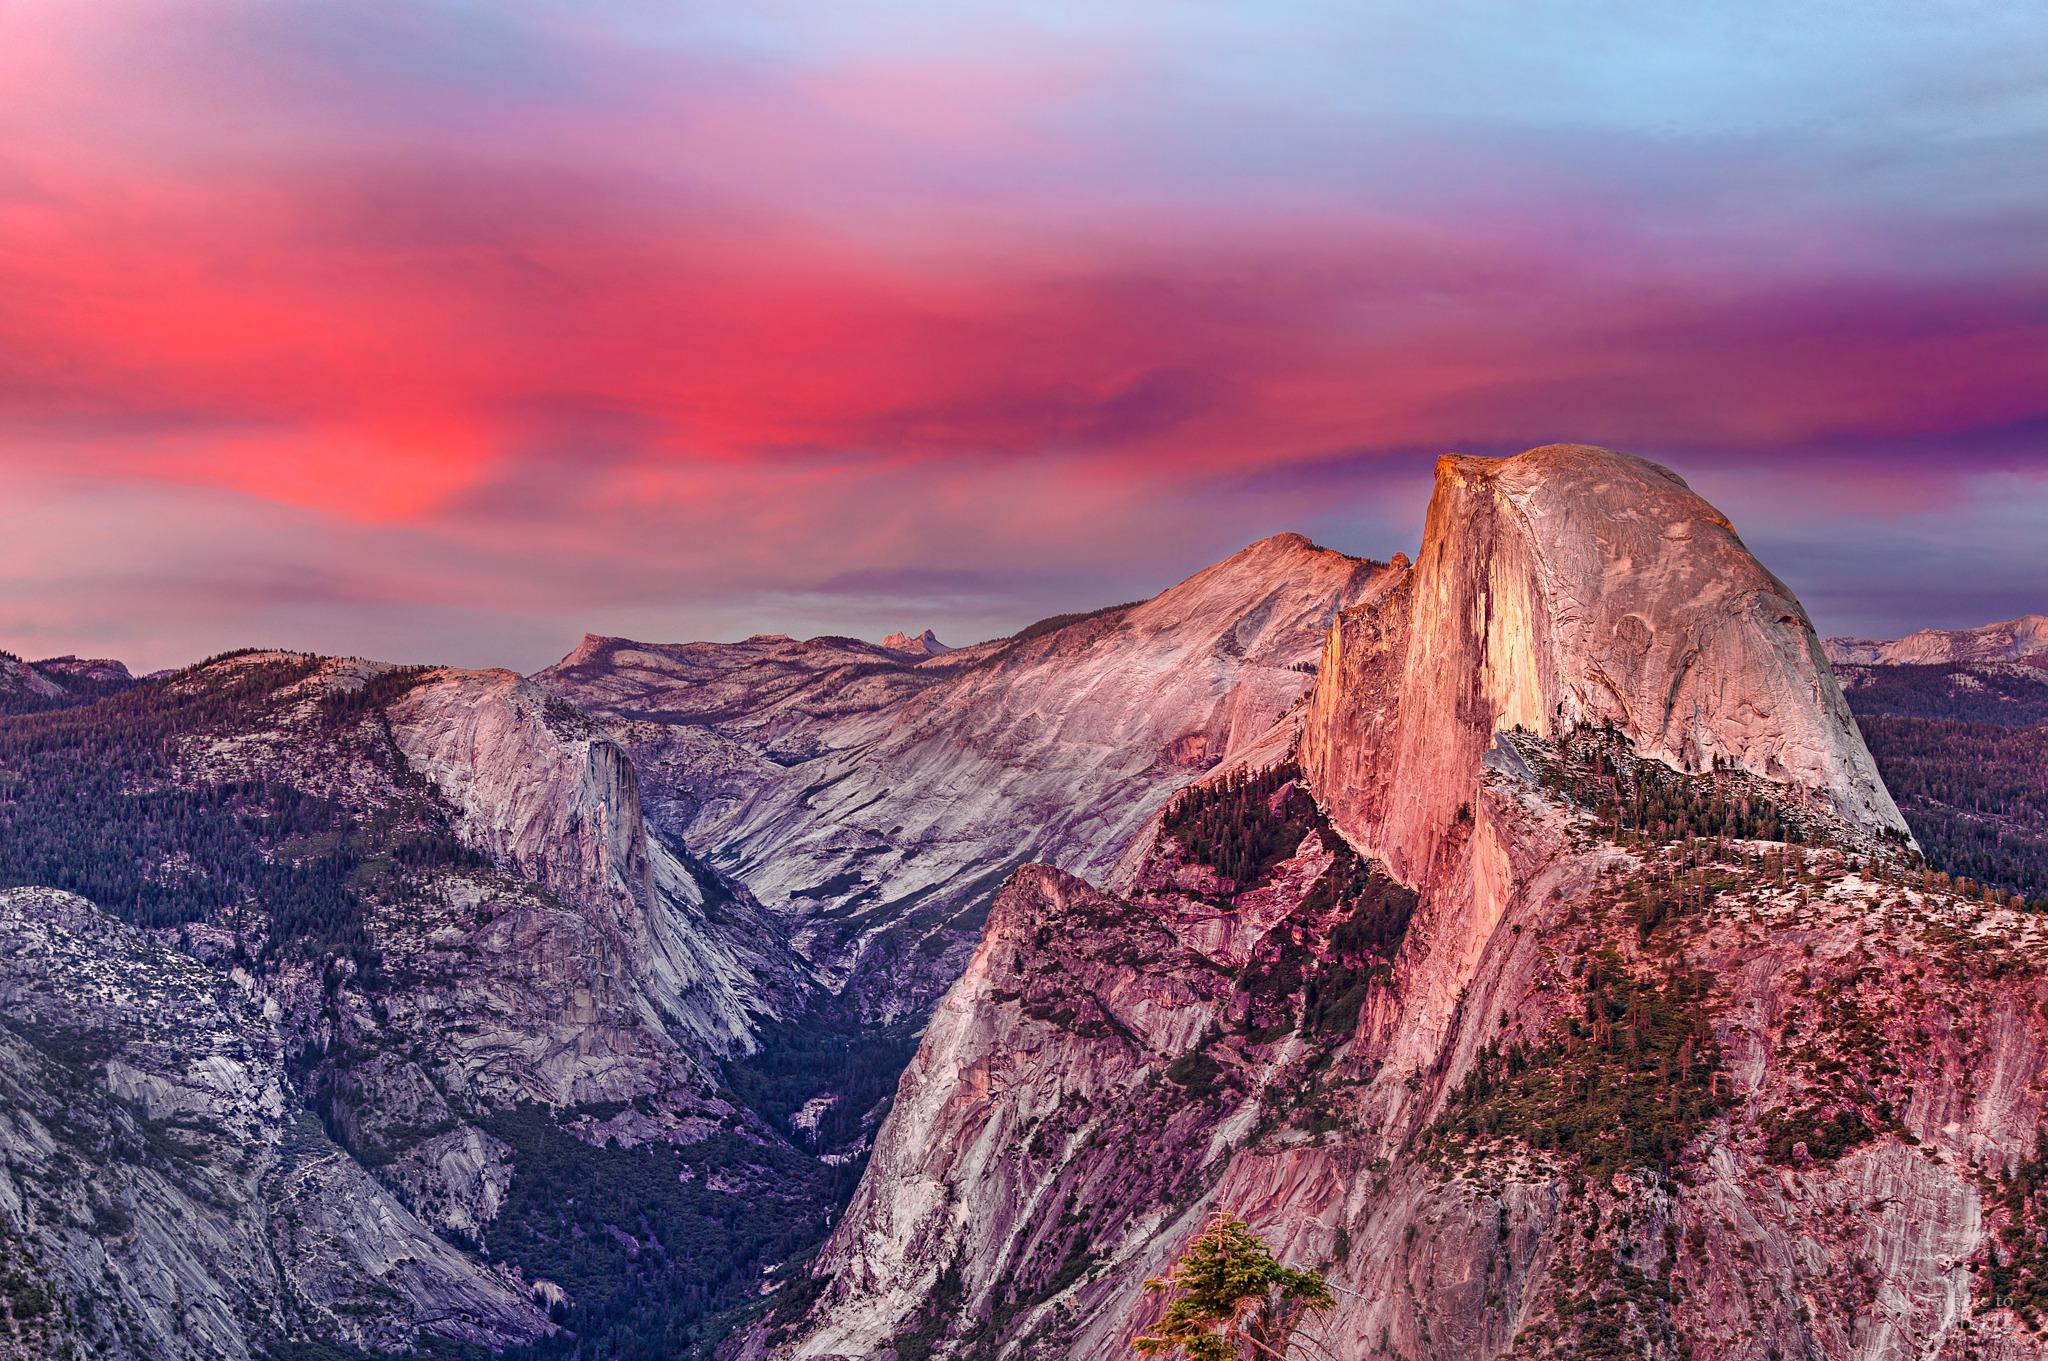 RT @Interior: We think our Yosemite v1.0 looks pretty good @YosemiteNPS #California http://t.co/TU4dFSzot1